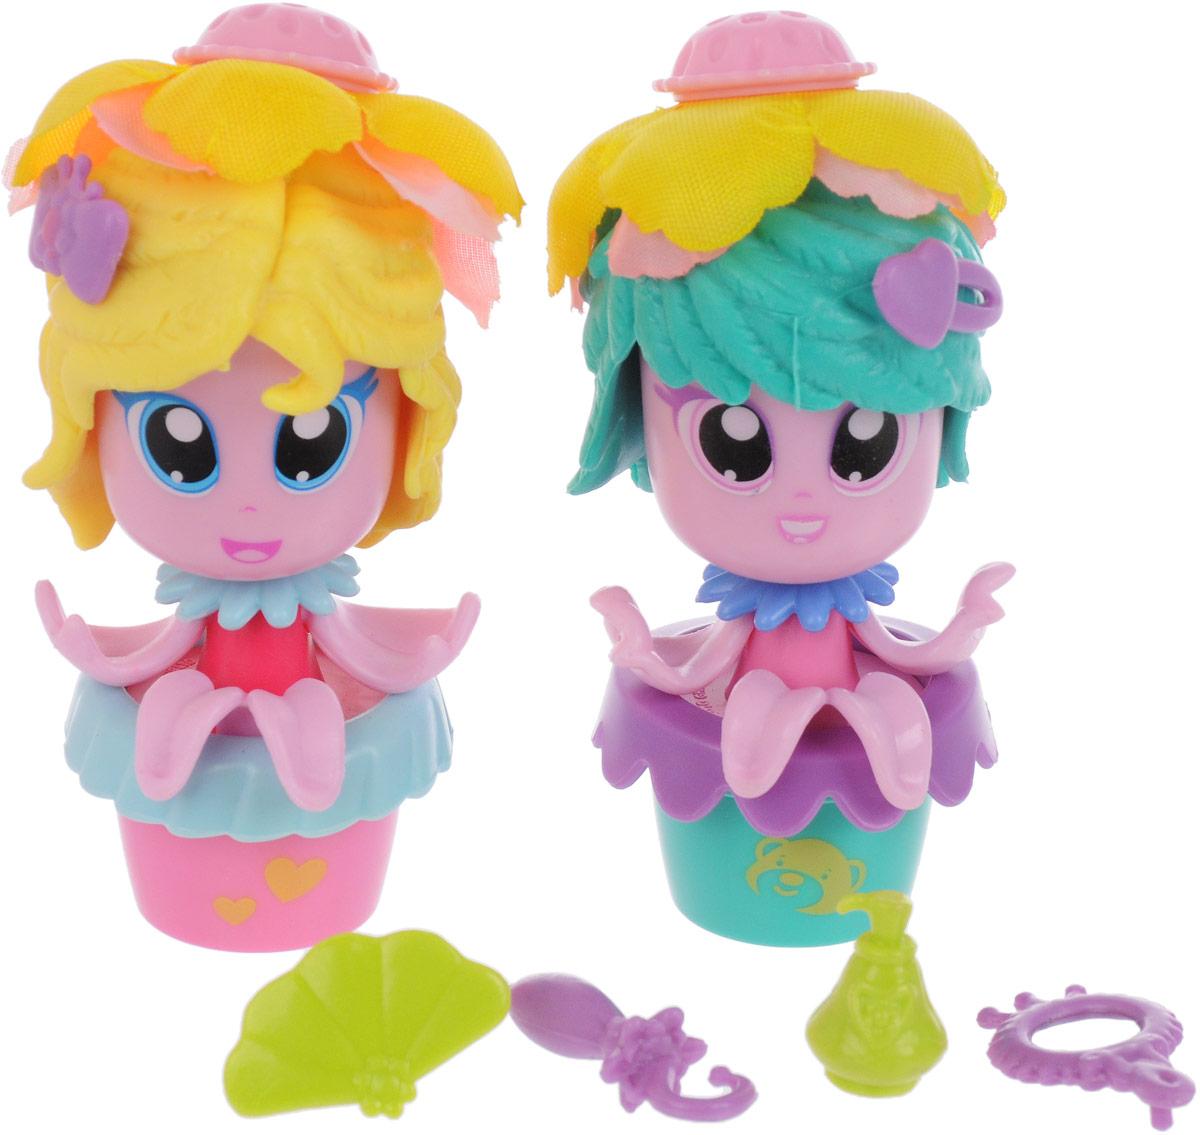 Daisy Набор мини-кукол Цветочек 2 шт куклы hasbro эг мини игровой набор мини кукол в аст